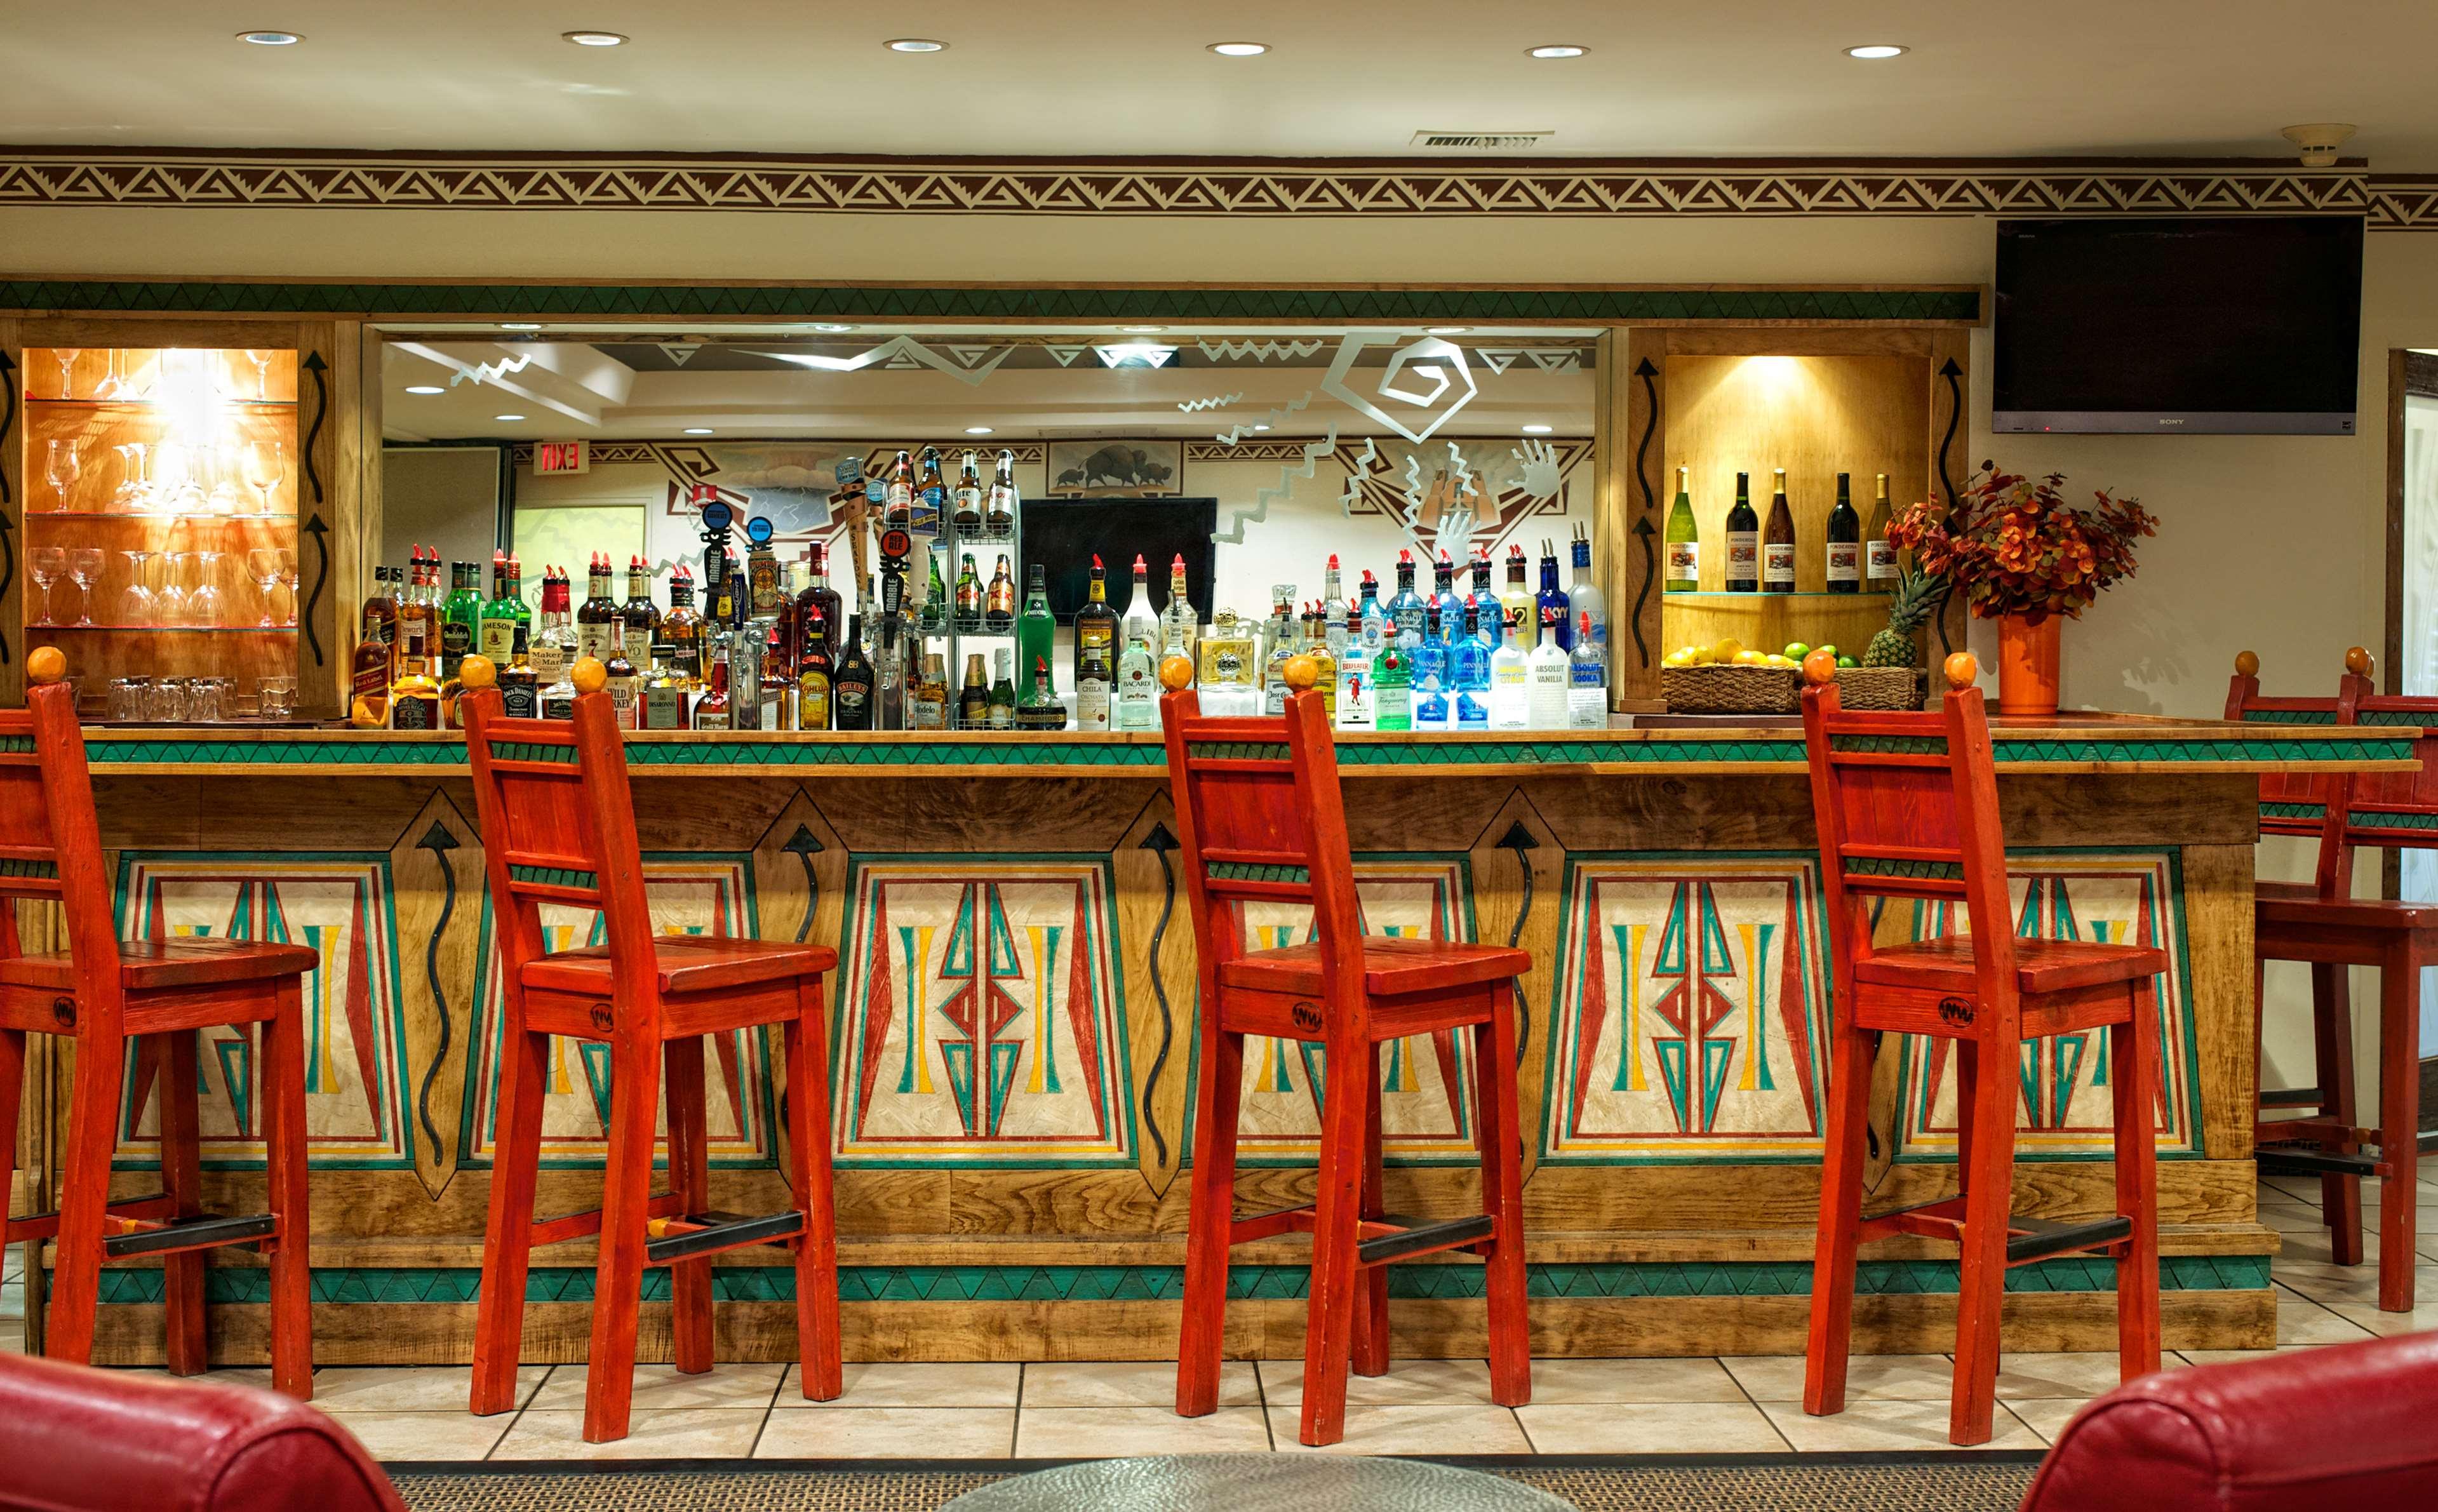 Best Western Plus Rio Grande Inn In Albuquerque Nm Hotels Motels 505 843 9500